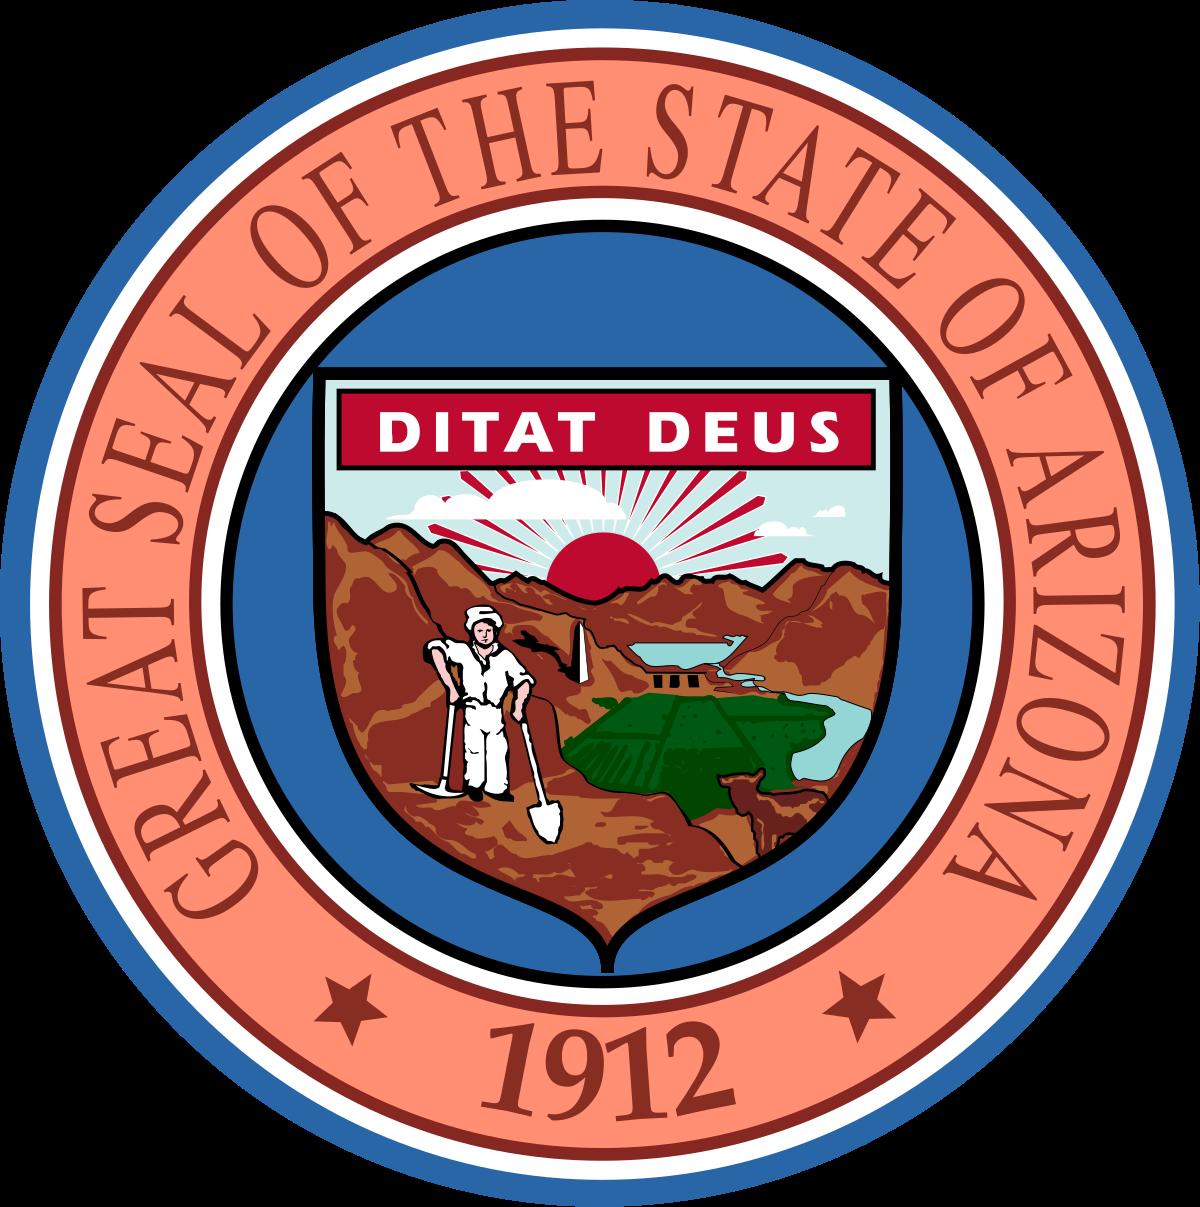 Az find logo clipart banner black and white download Arizona House of Representatives - Wikipedia banner black and white download